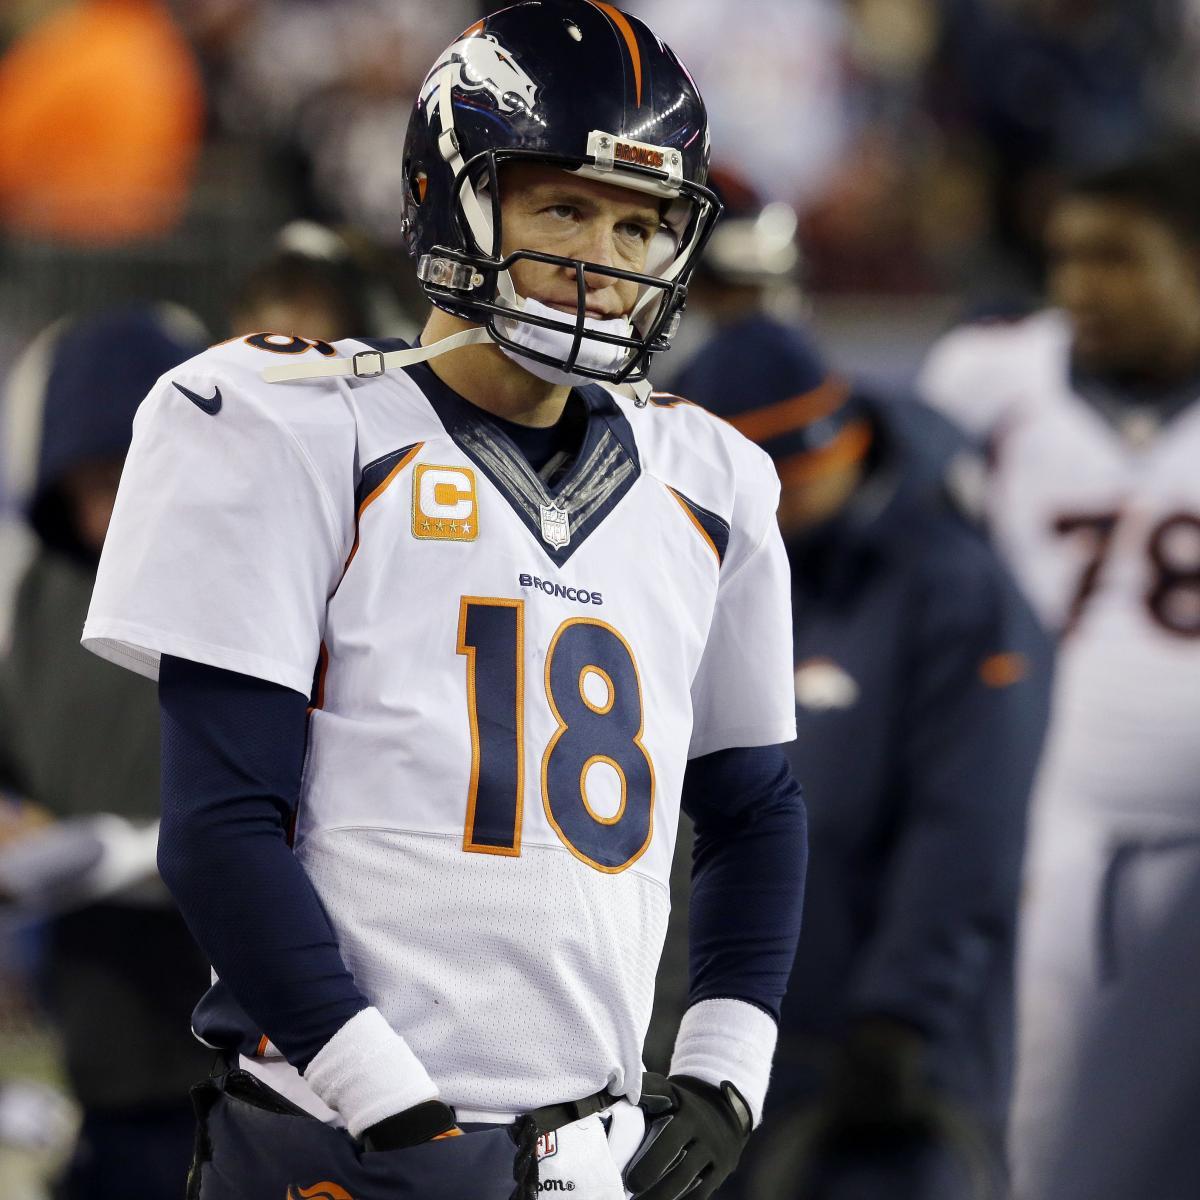 Denver Broncos Vs. Oakland Raiders Betting Odds, Analysis